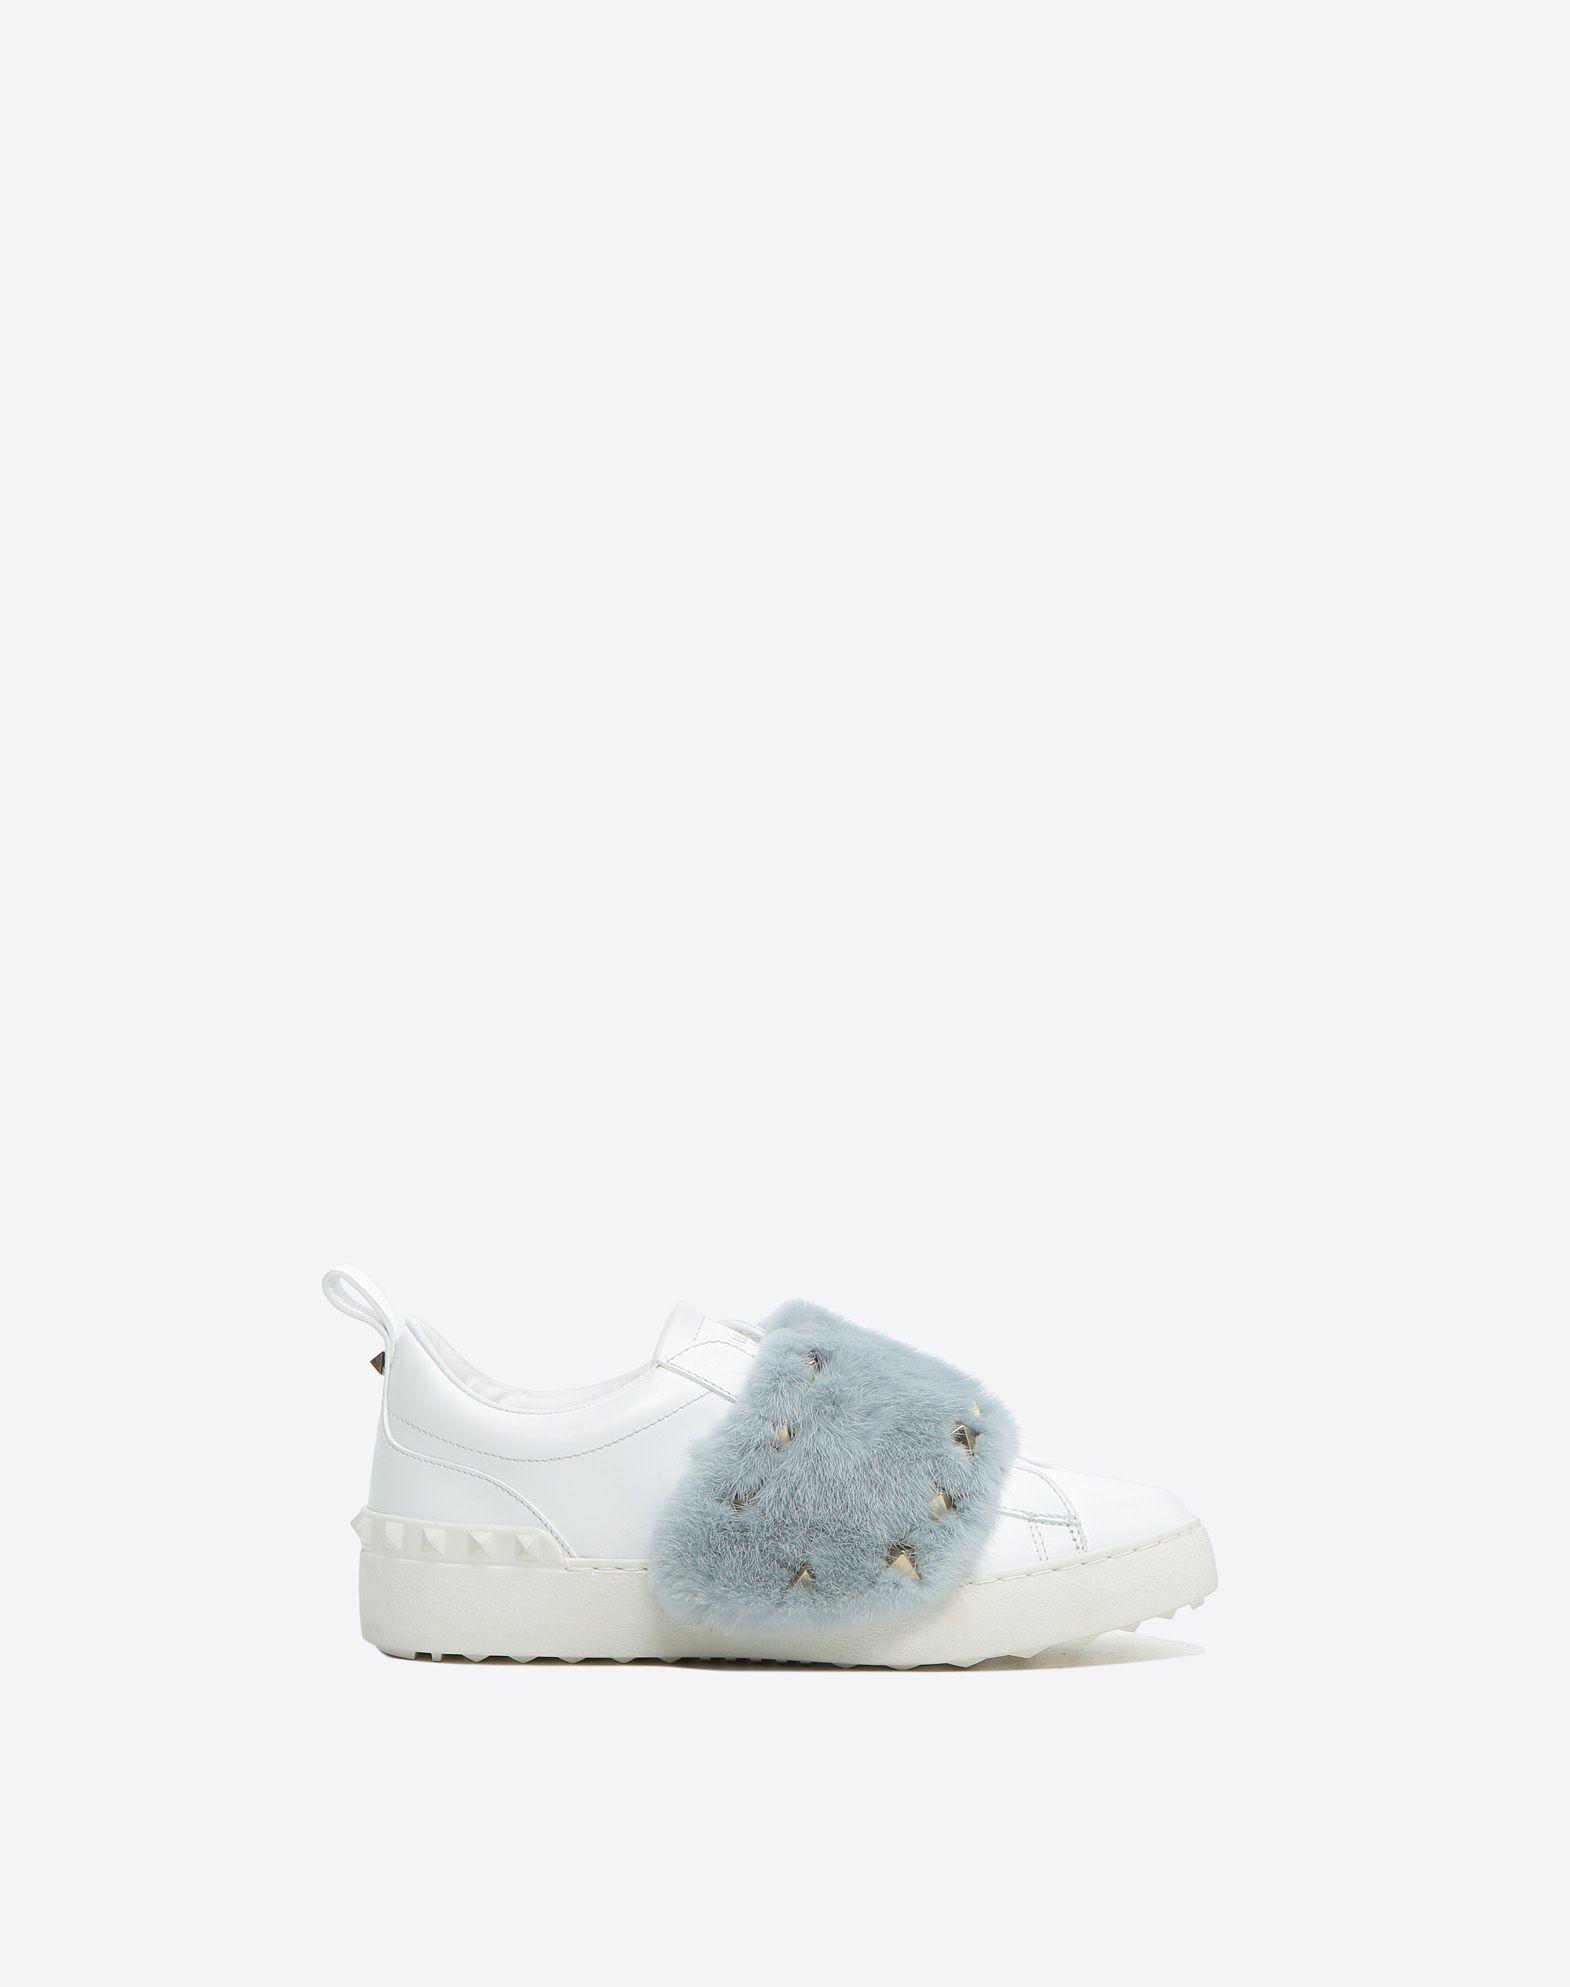 VALENTINO Fur Solid color Round toeline Flat Rubber sole Studs  45368928ki